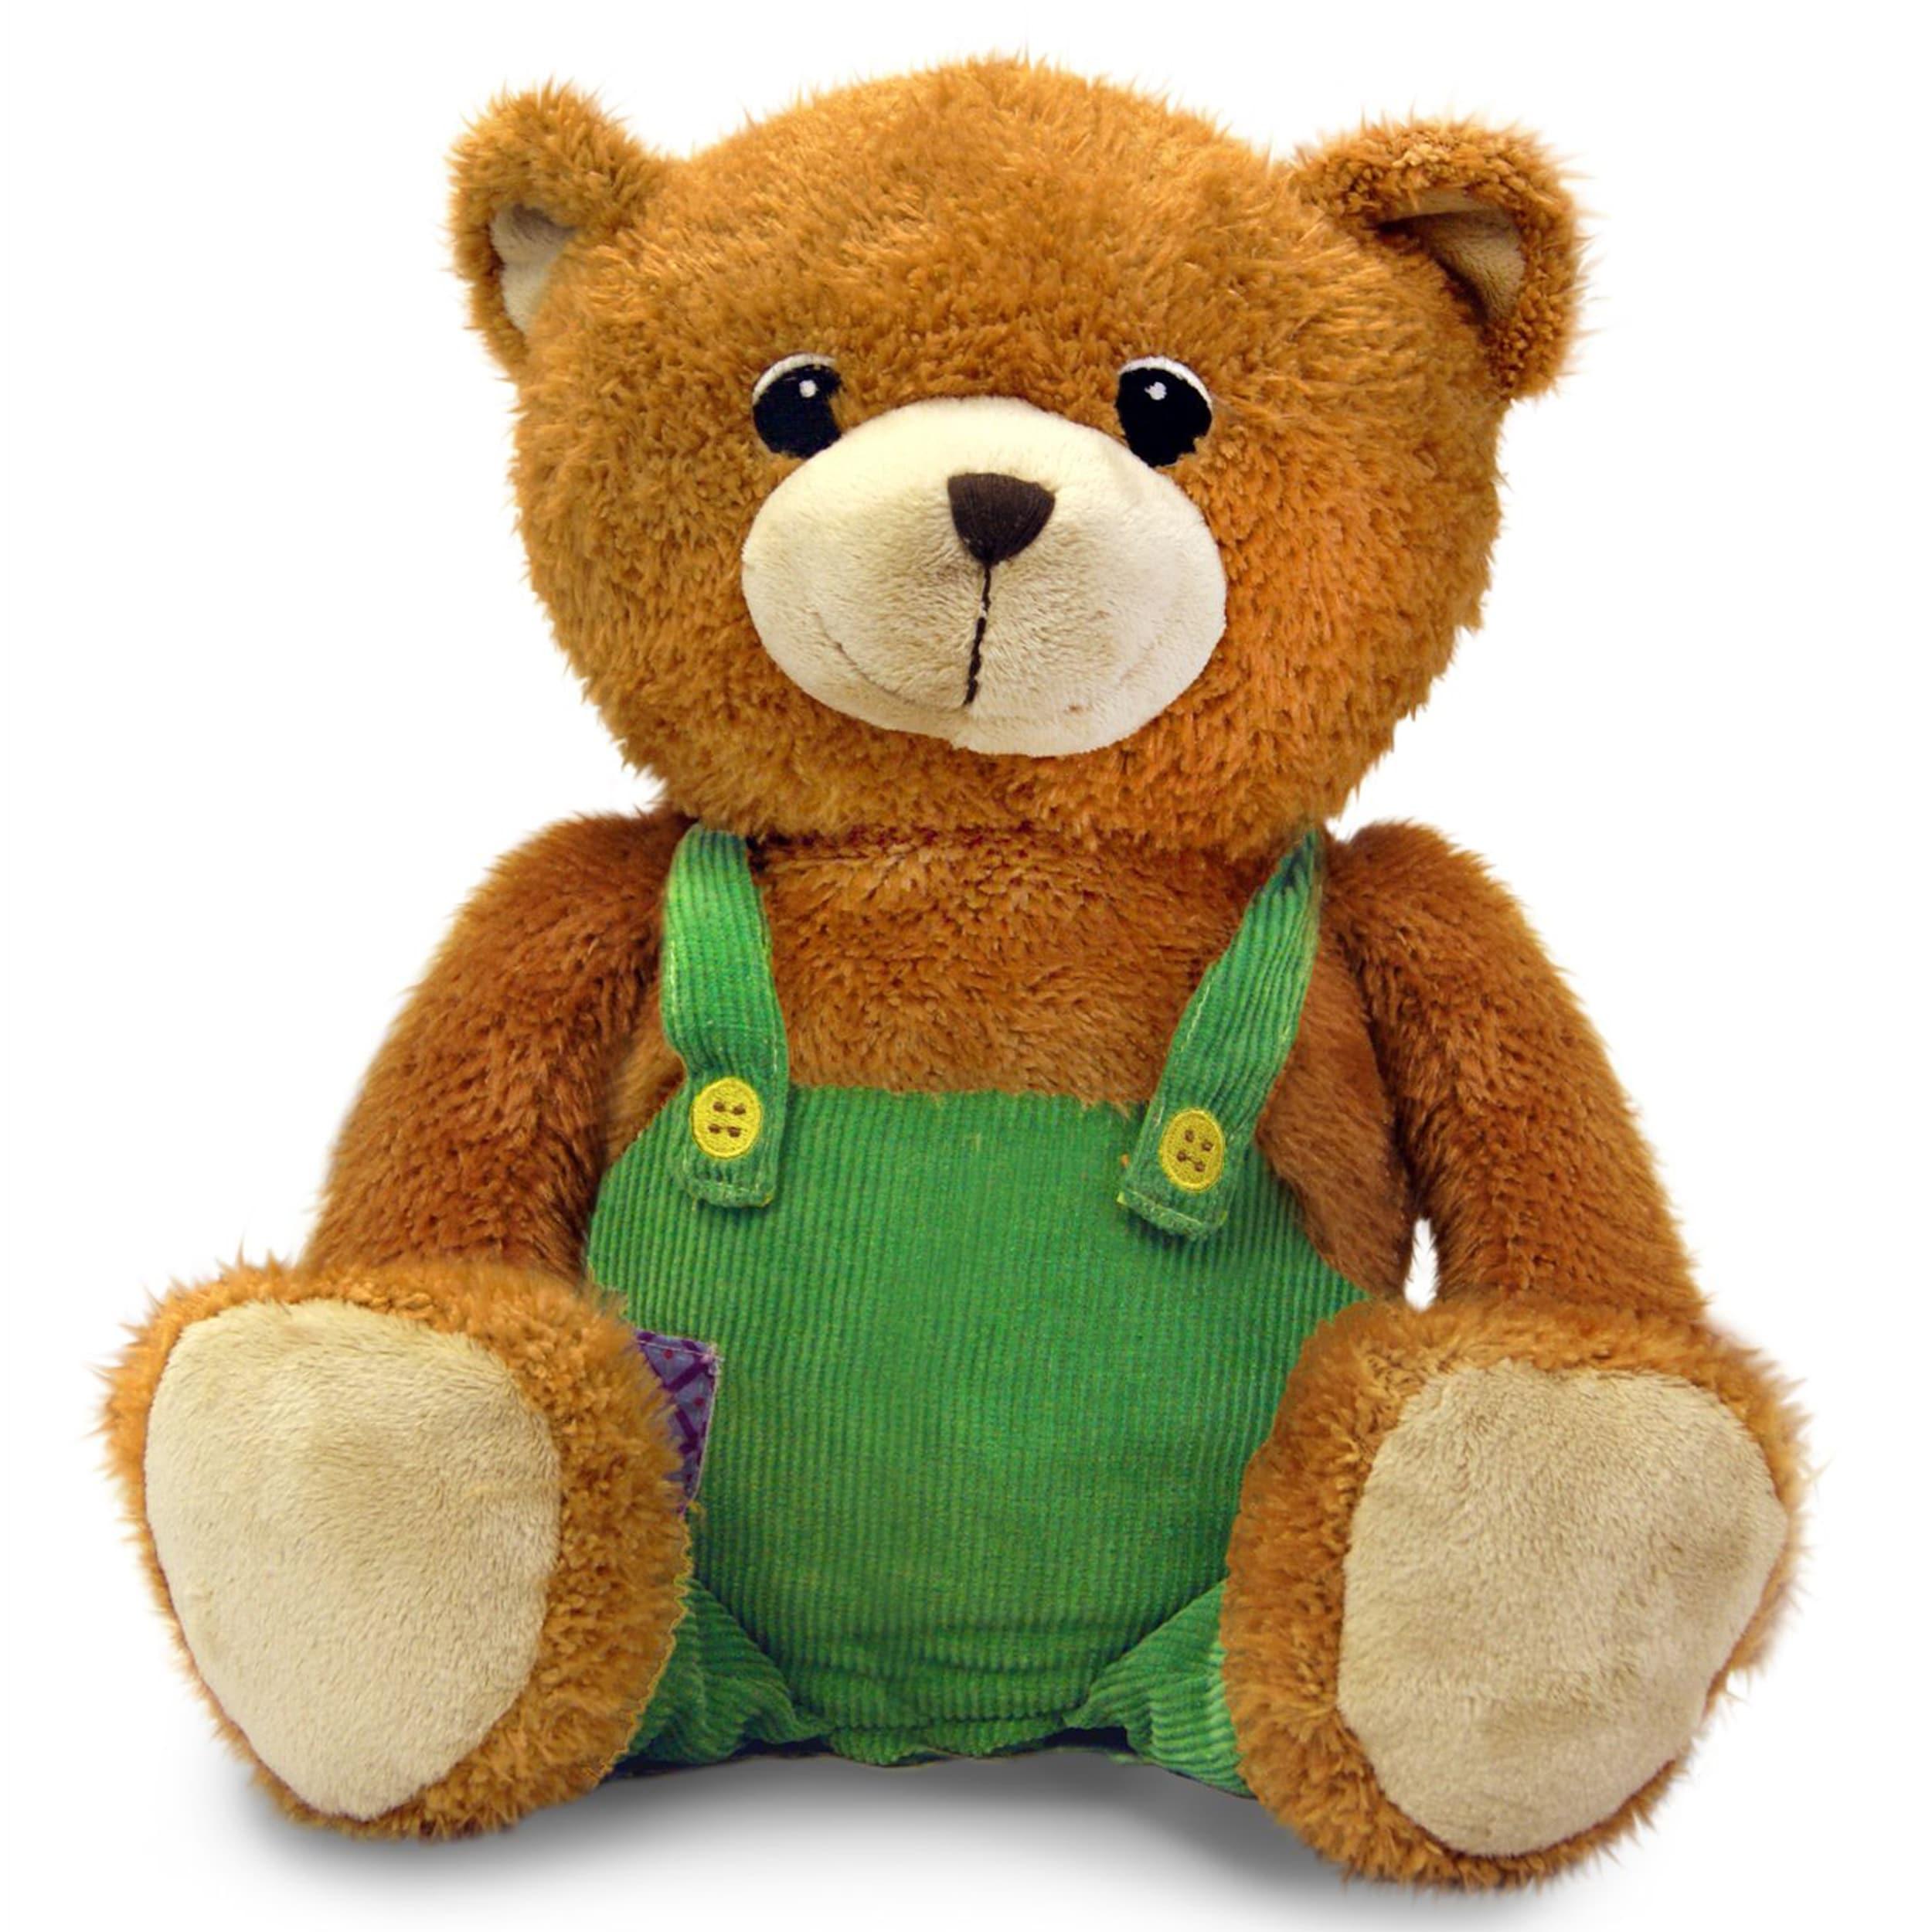 Zoobies 'Corduroy the Bear' Storytime Pal